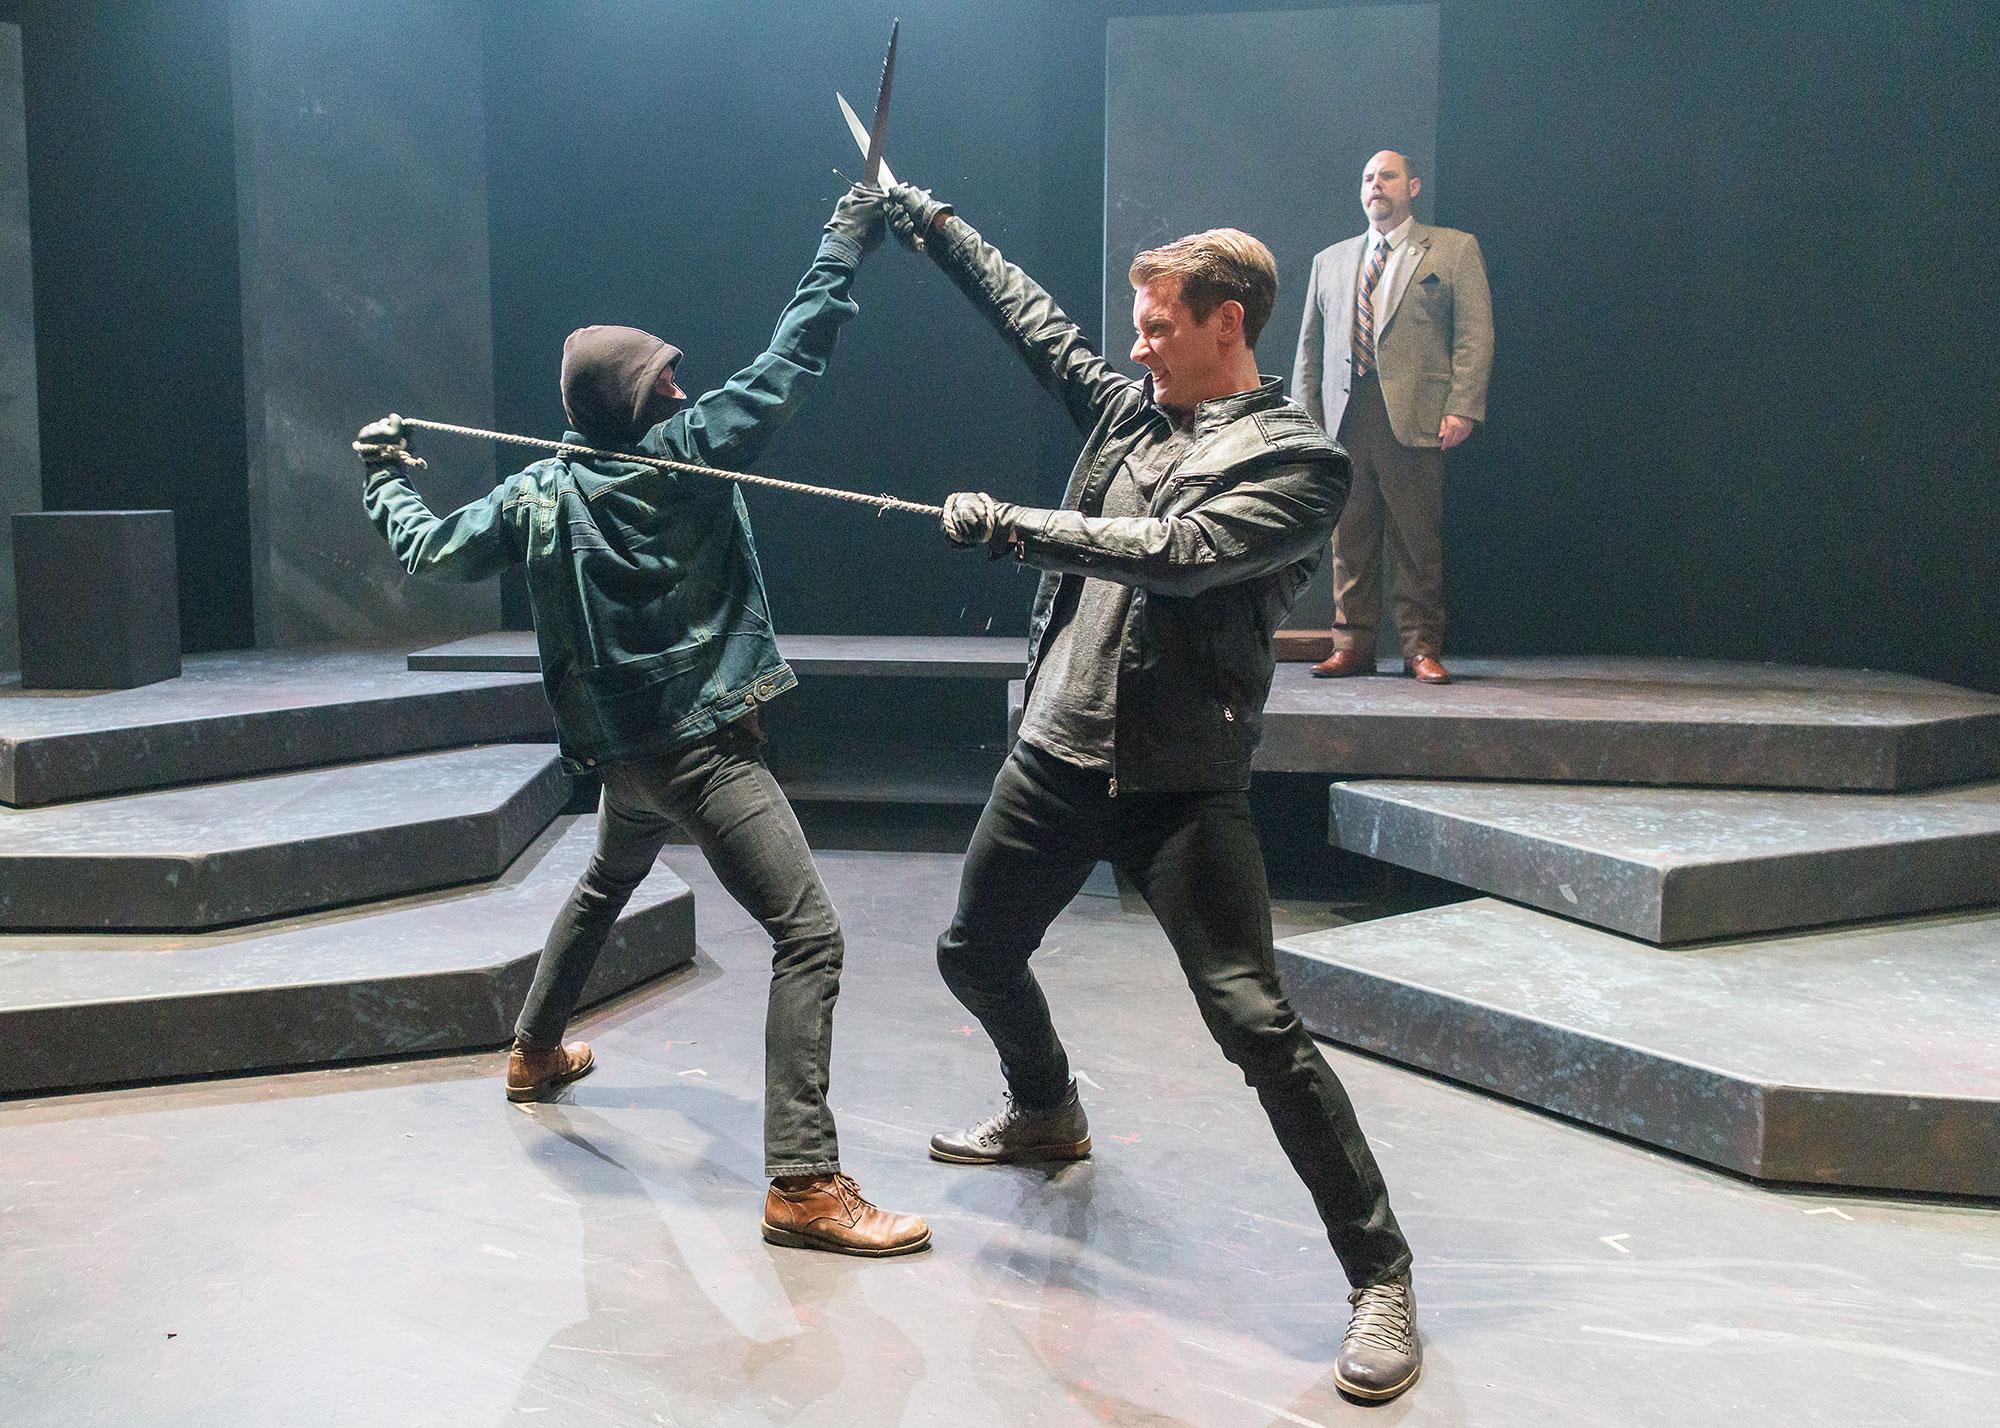 King-Lear-2019-Photo-Credit-Andy-Dudik-(17).jpg